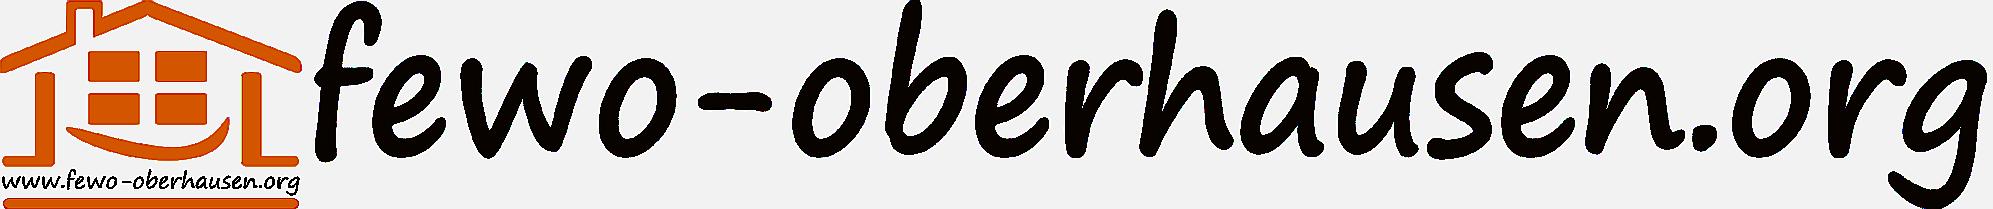 fewo-oberhausen.org